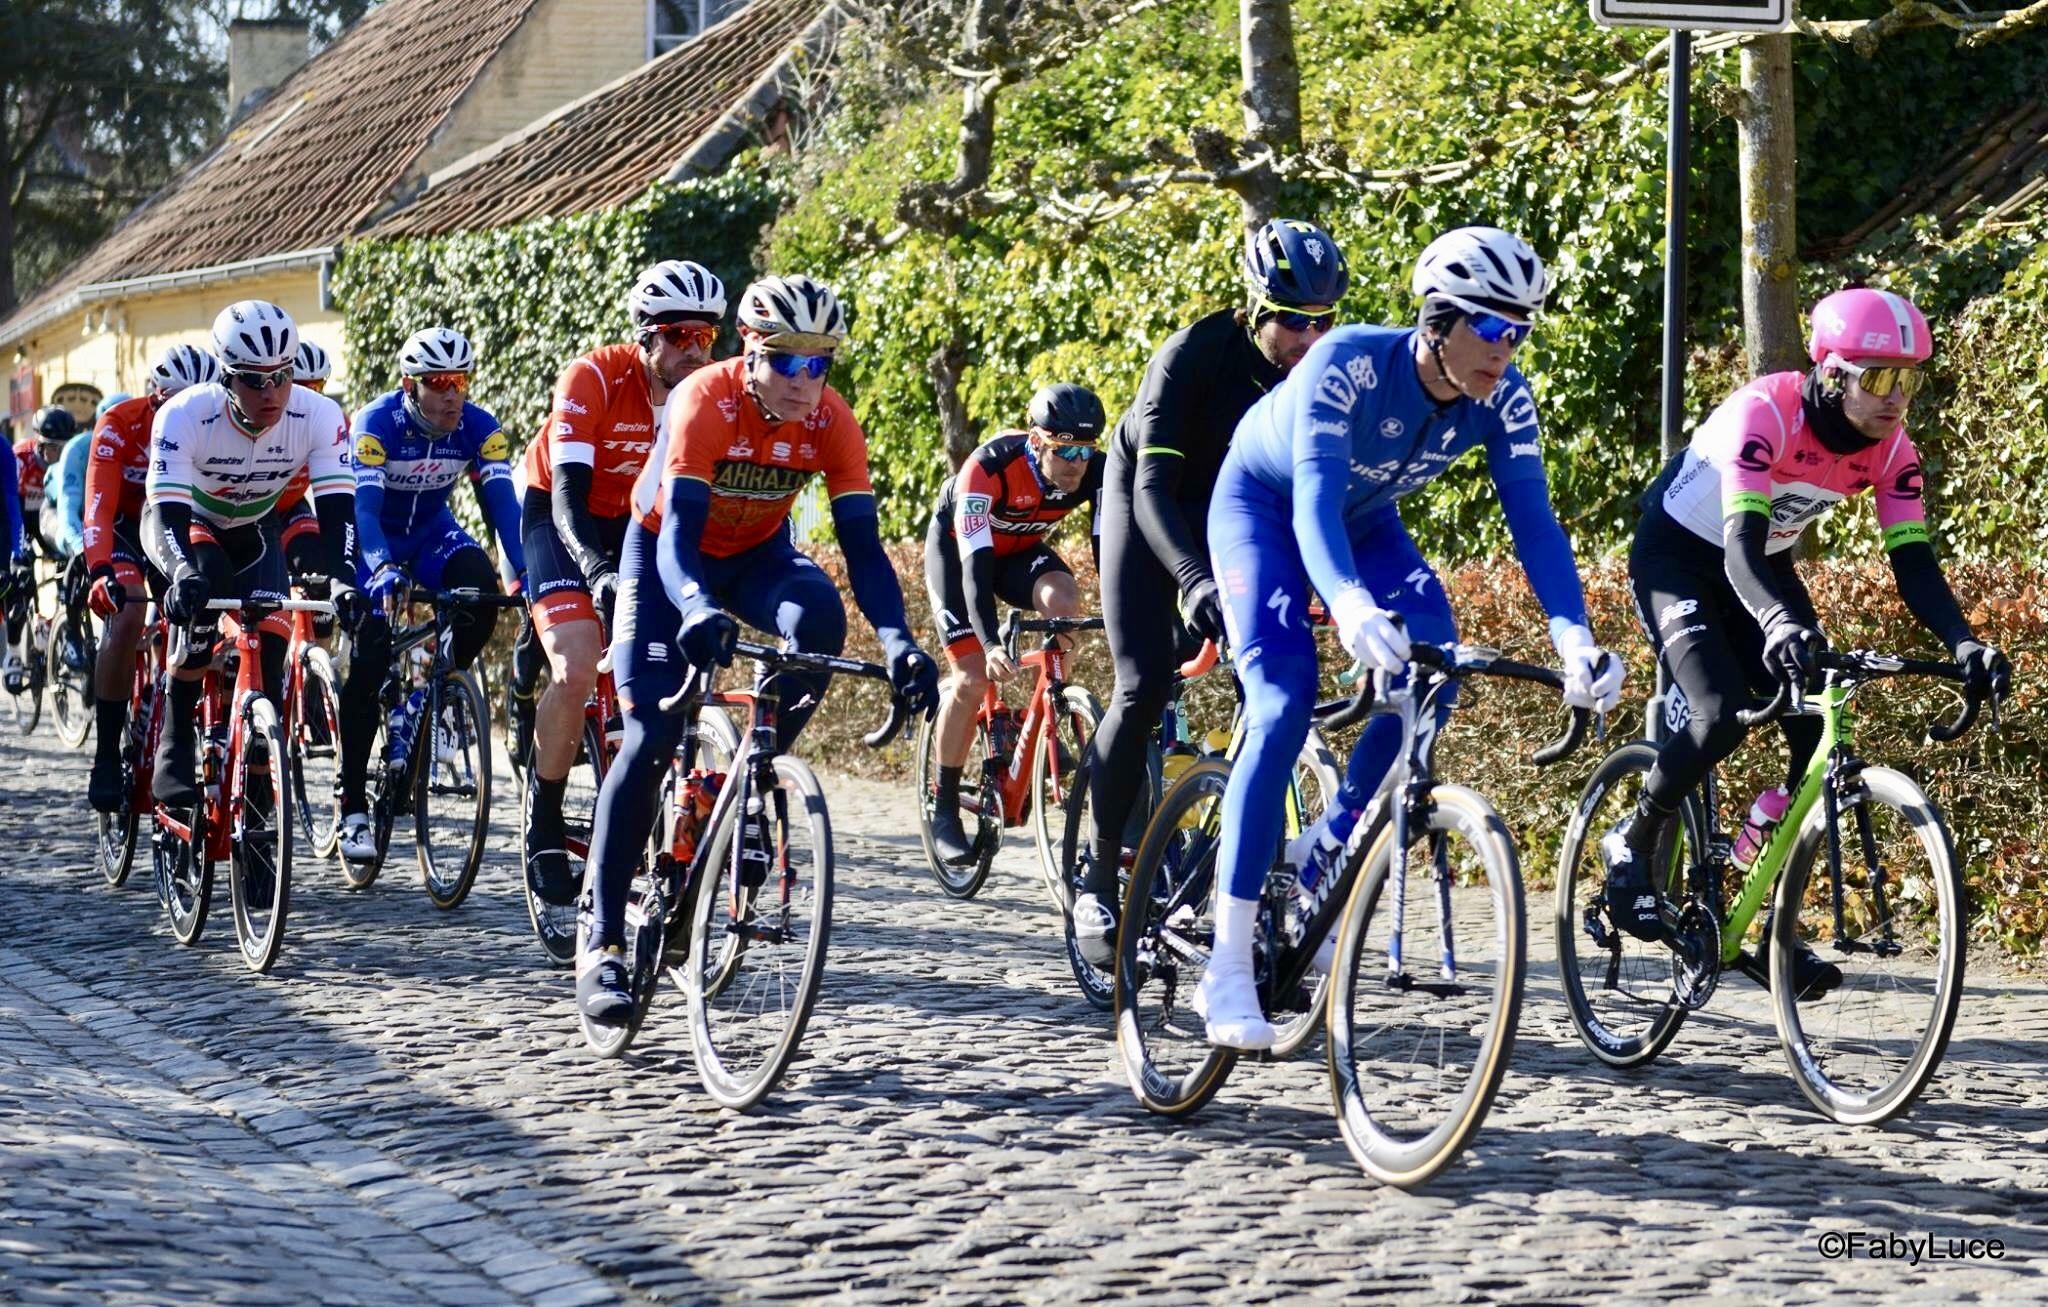 www.tdlccycling.com/wp-content/uploads/2018/02/OMLOOP-COBBLES.jpg